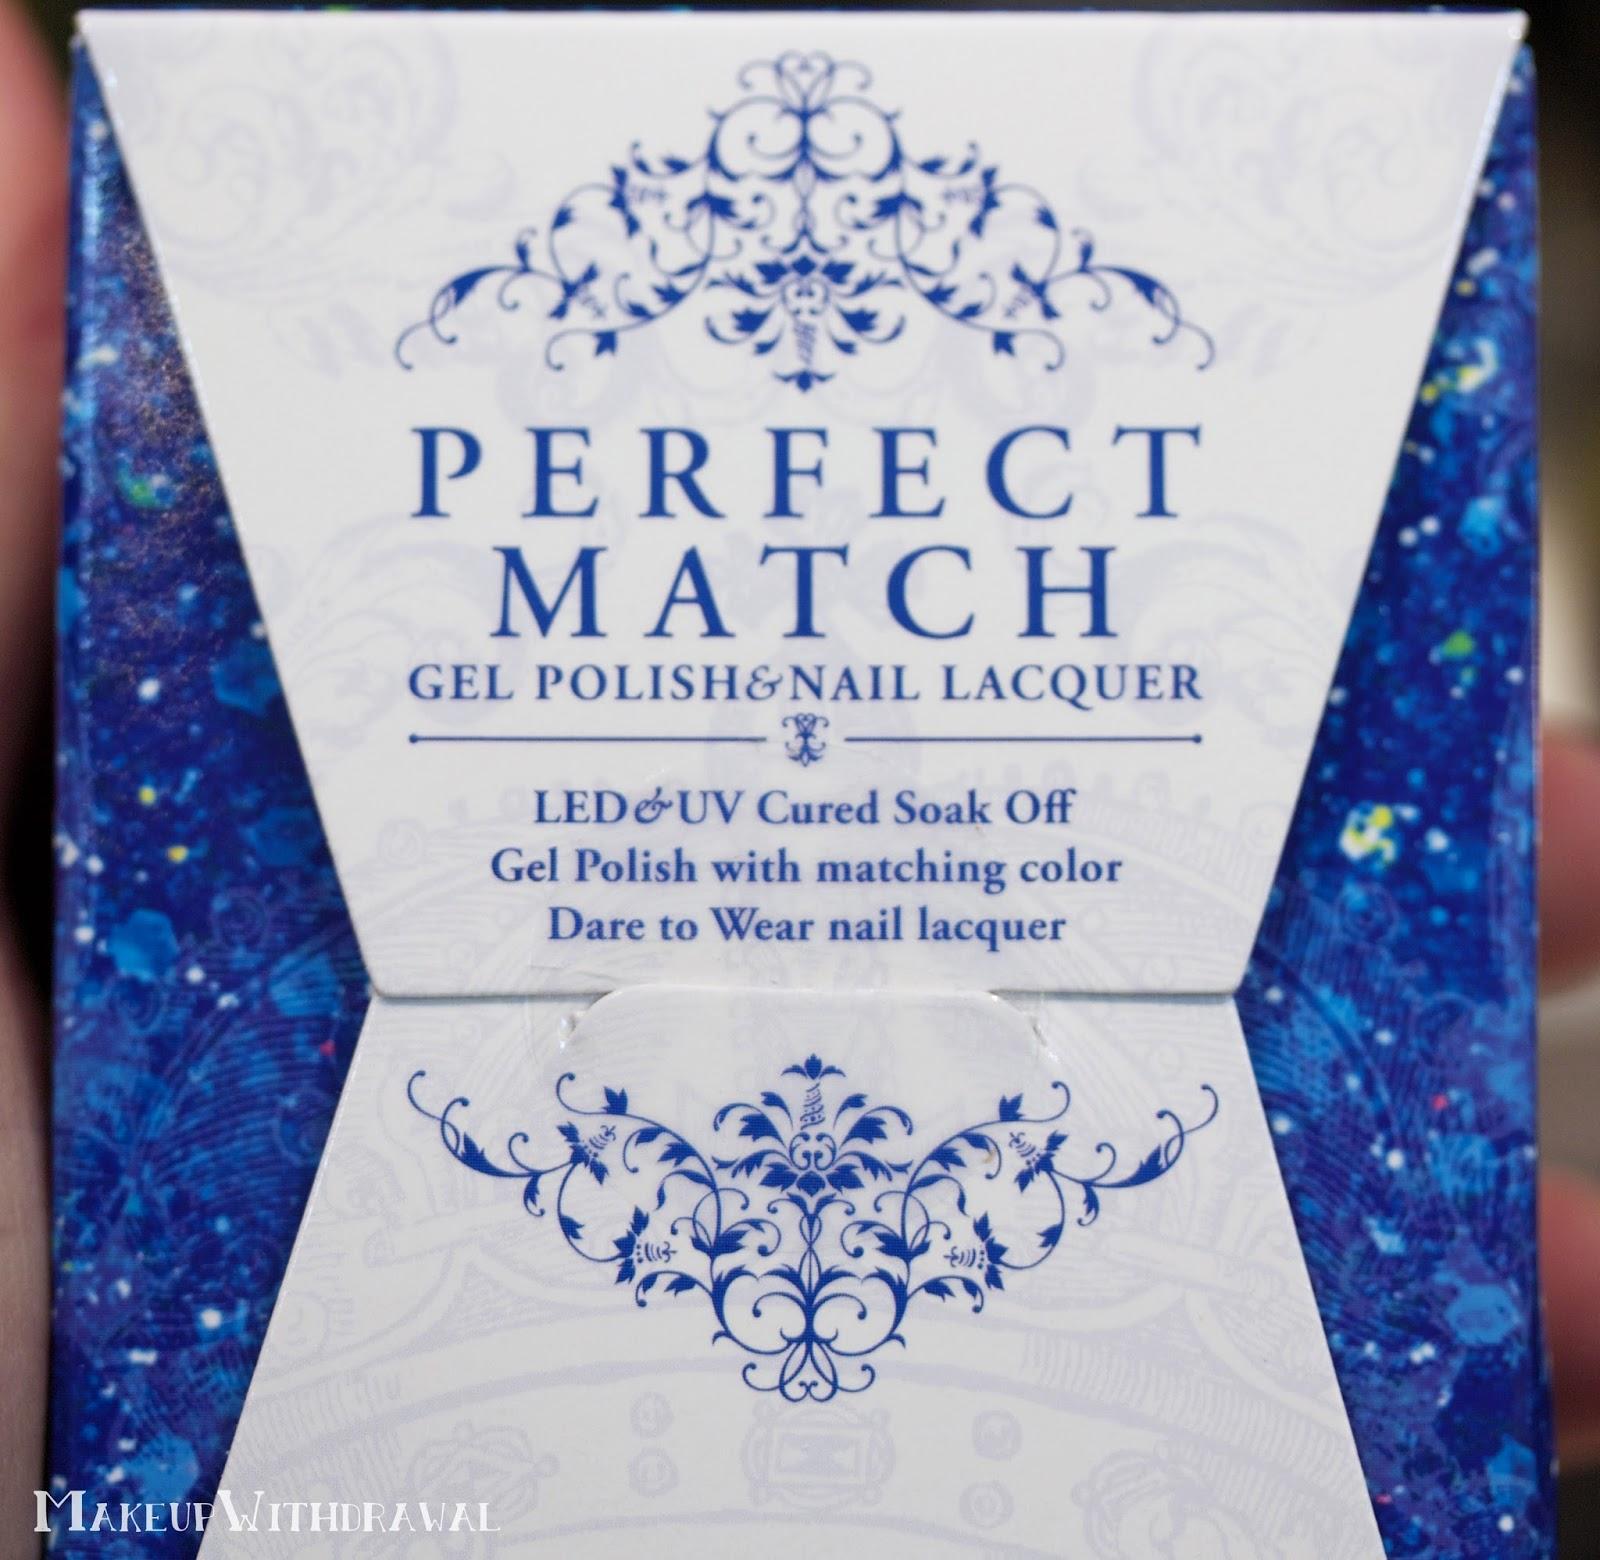 Le Chat Our Secret Eden Perfect Match Mood Gel Polishes